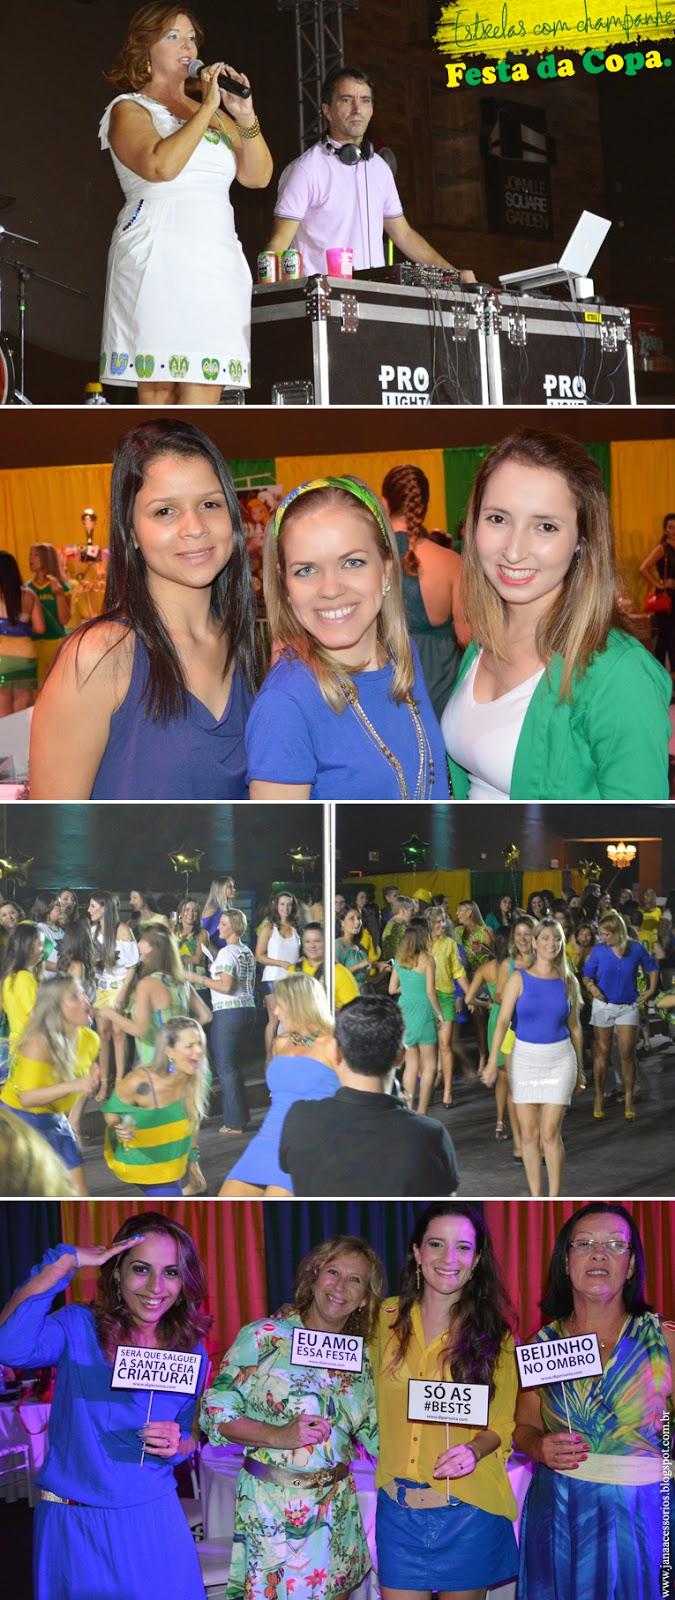 Festa da Copa - Estrelas com champanhe, look, copa, brasil, moda, estilo, fashion, style, estilo